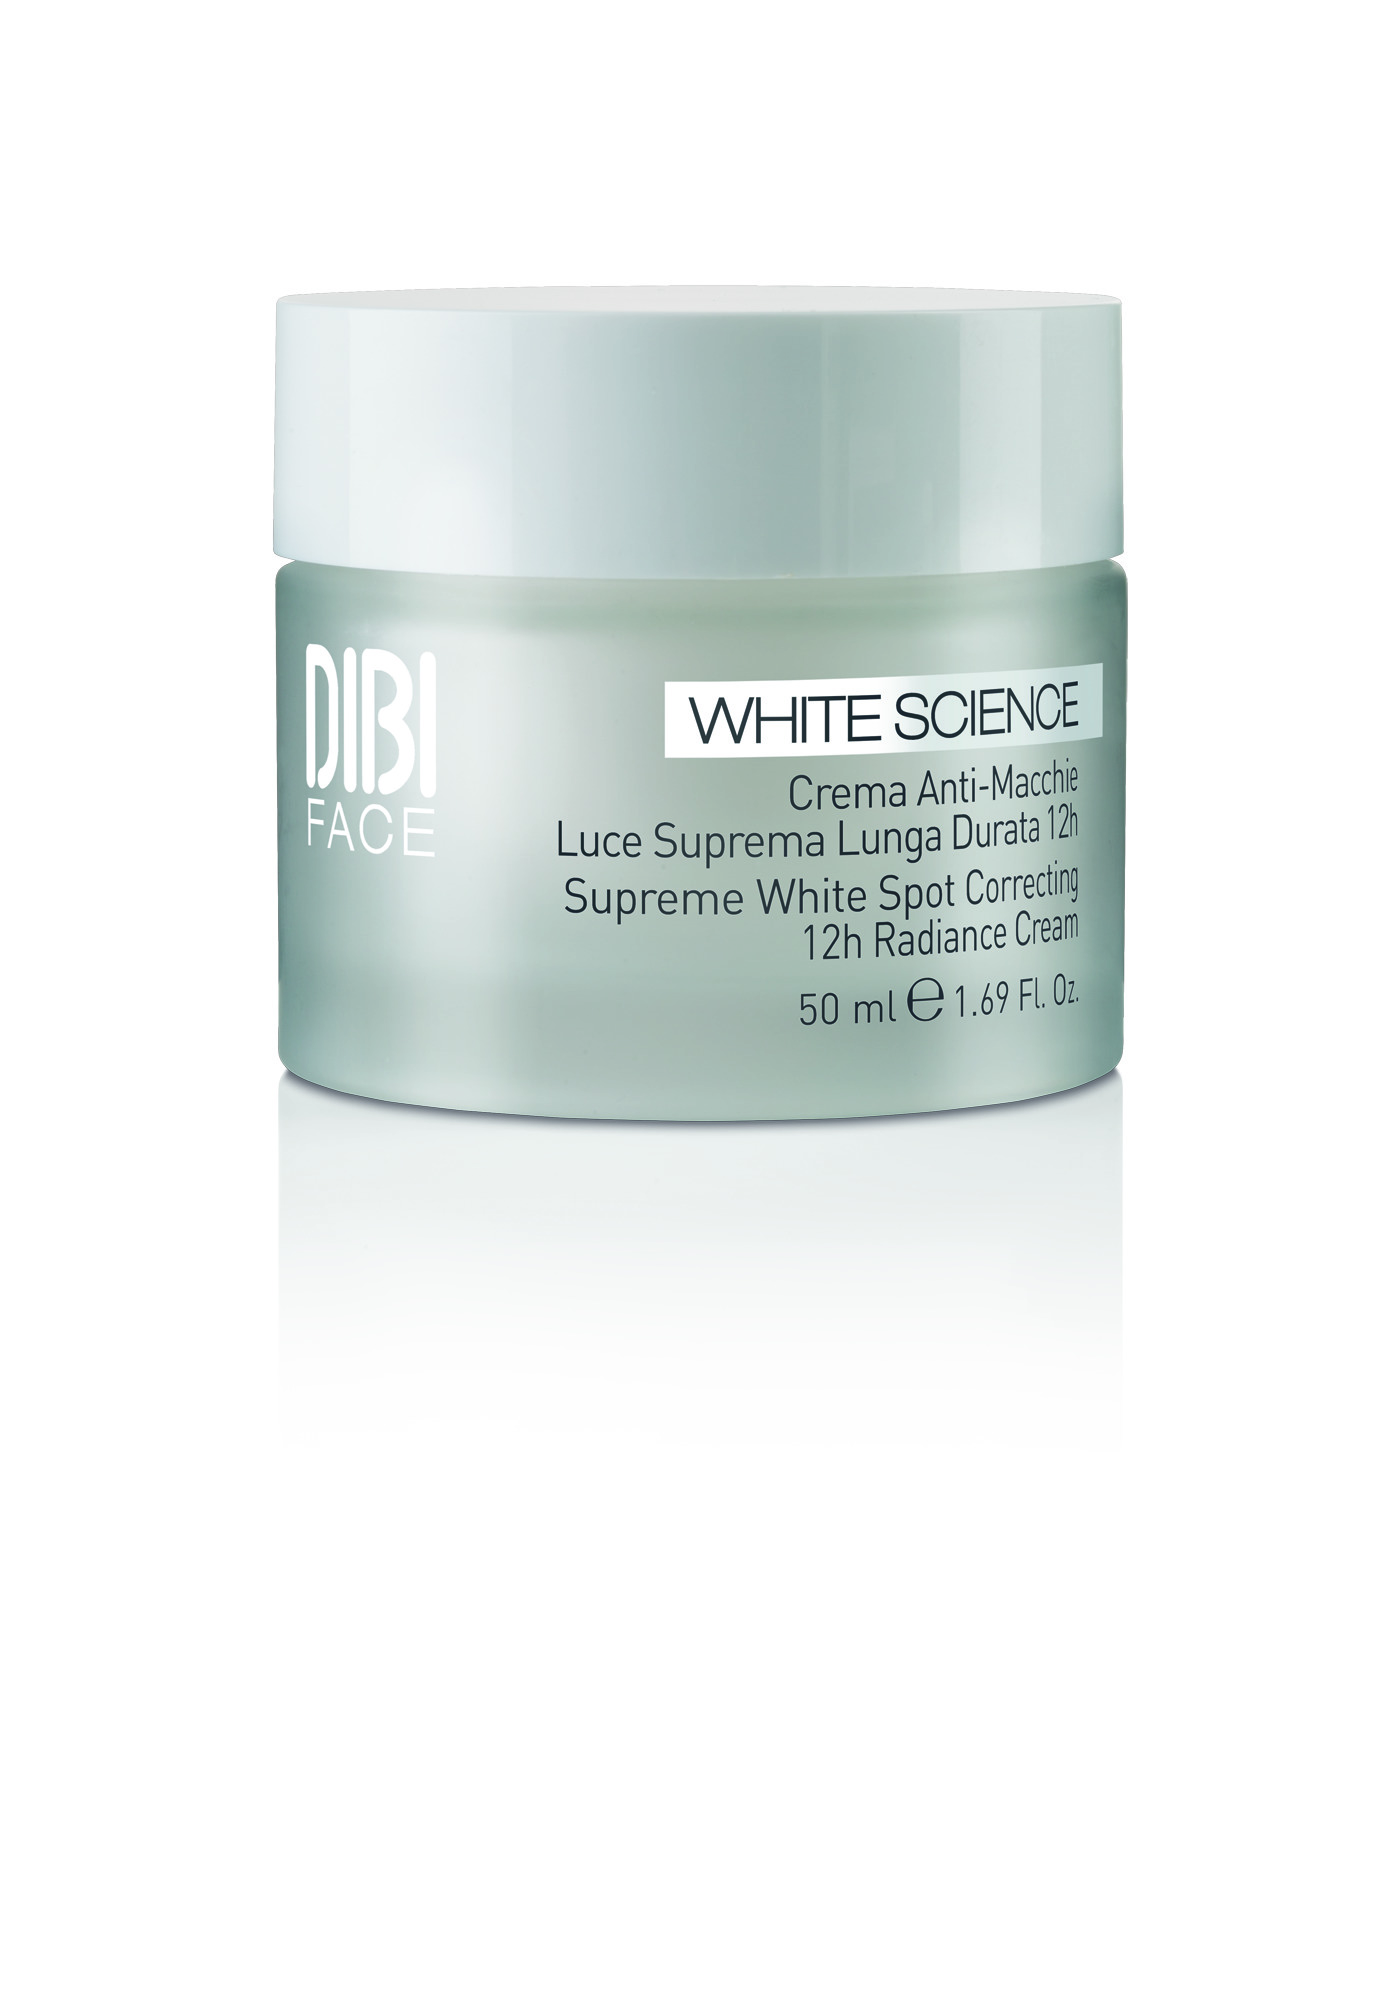 DIBI White Science White Spot Correcting 12h Radiance Cream